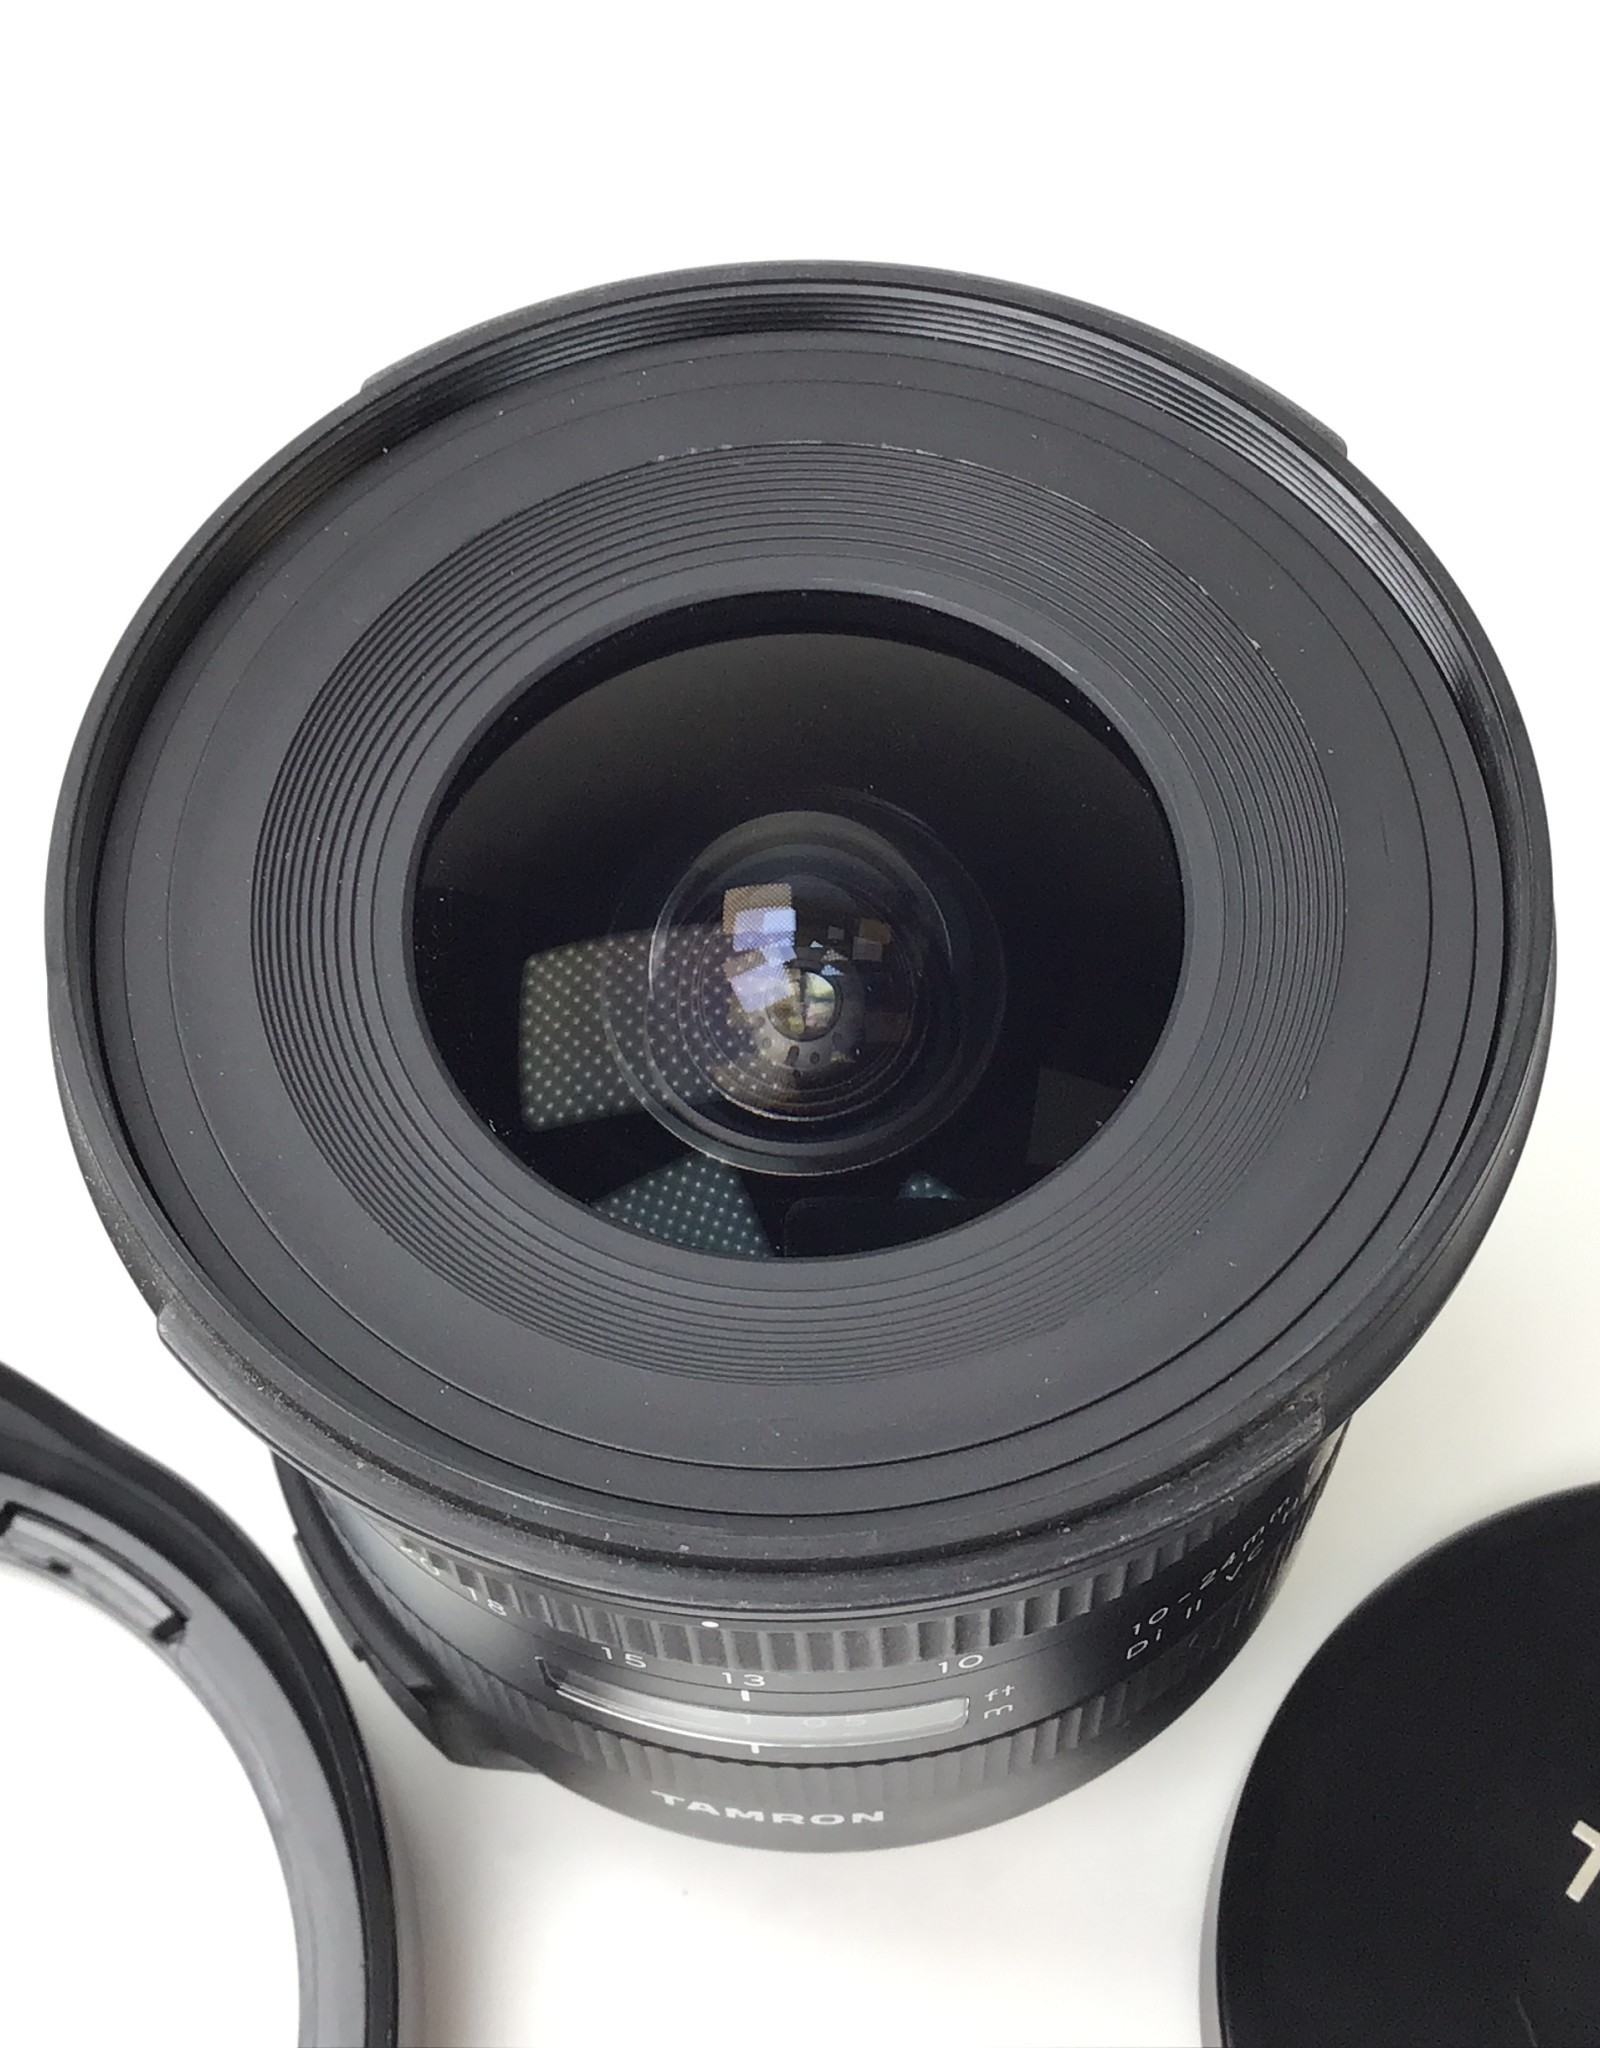 TAMRON Tamron 10-24mm f3.5-4.5 Di II VC HLD Lens for Nikon F Used EX